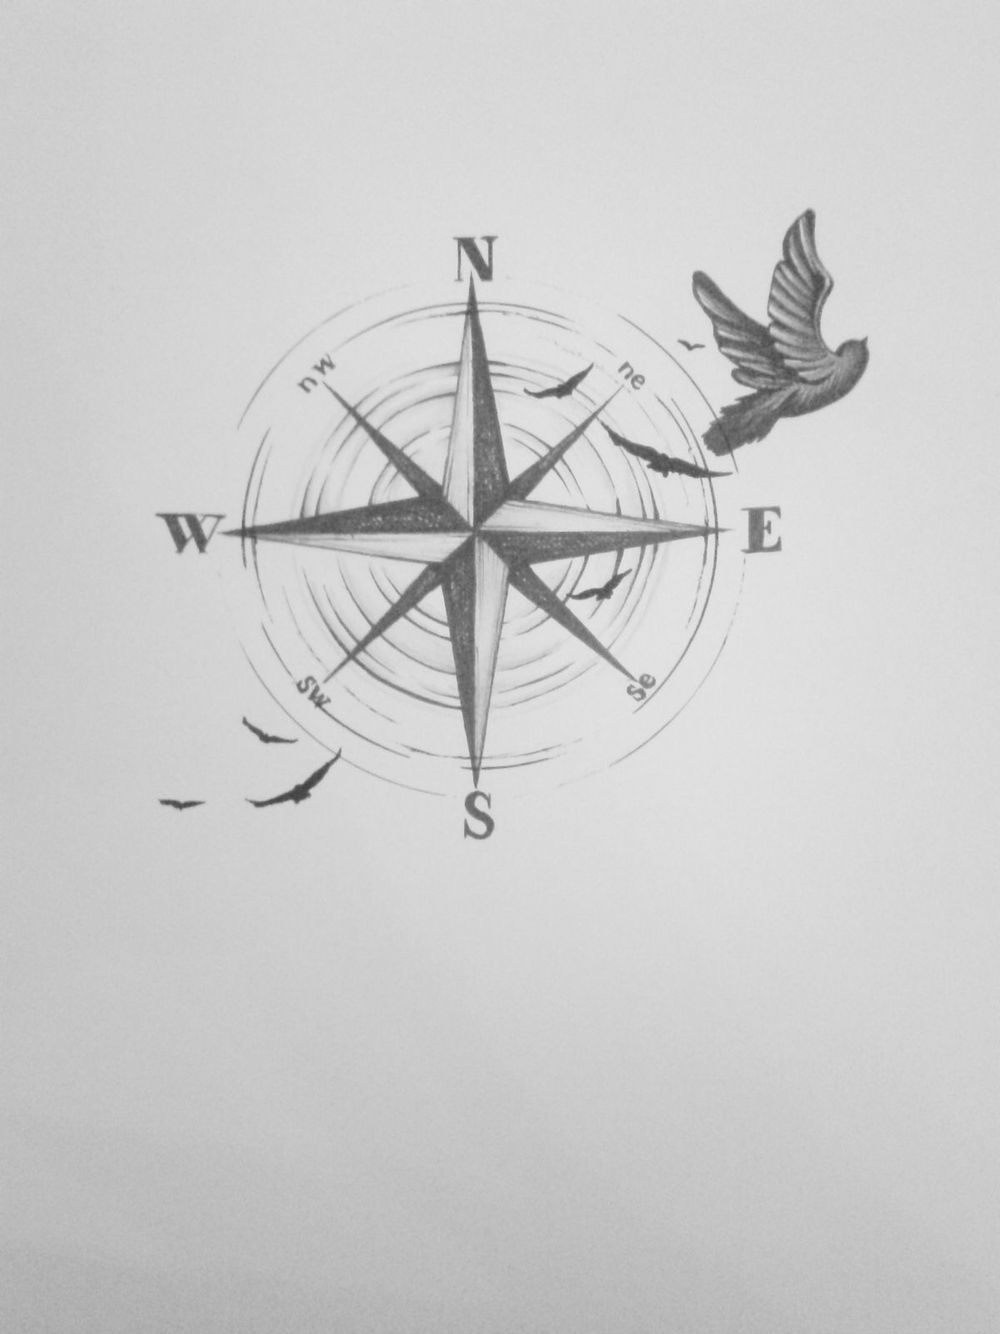 dessin boussole tatoo pinterest tattoos freedom tattoos and compass tattoo. Black Bedroom Furniture Sets. Home Design Ideas